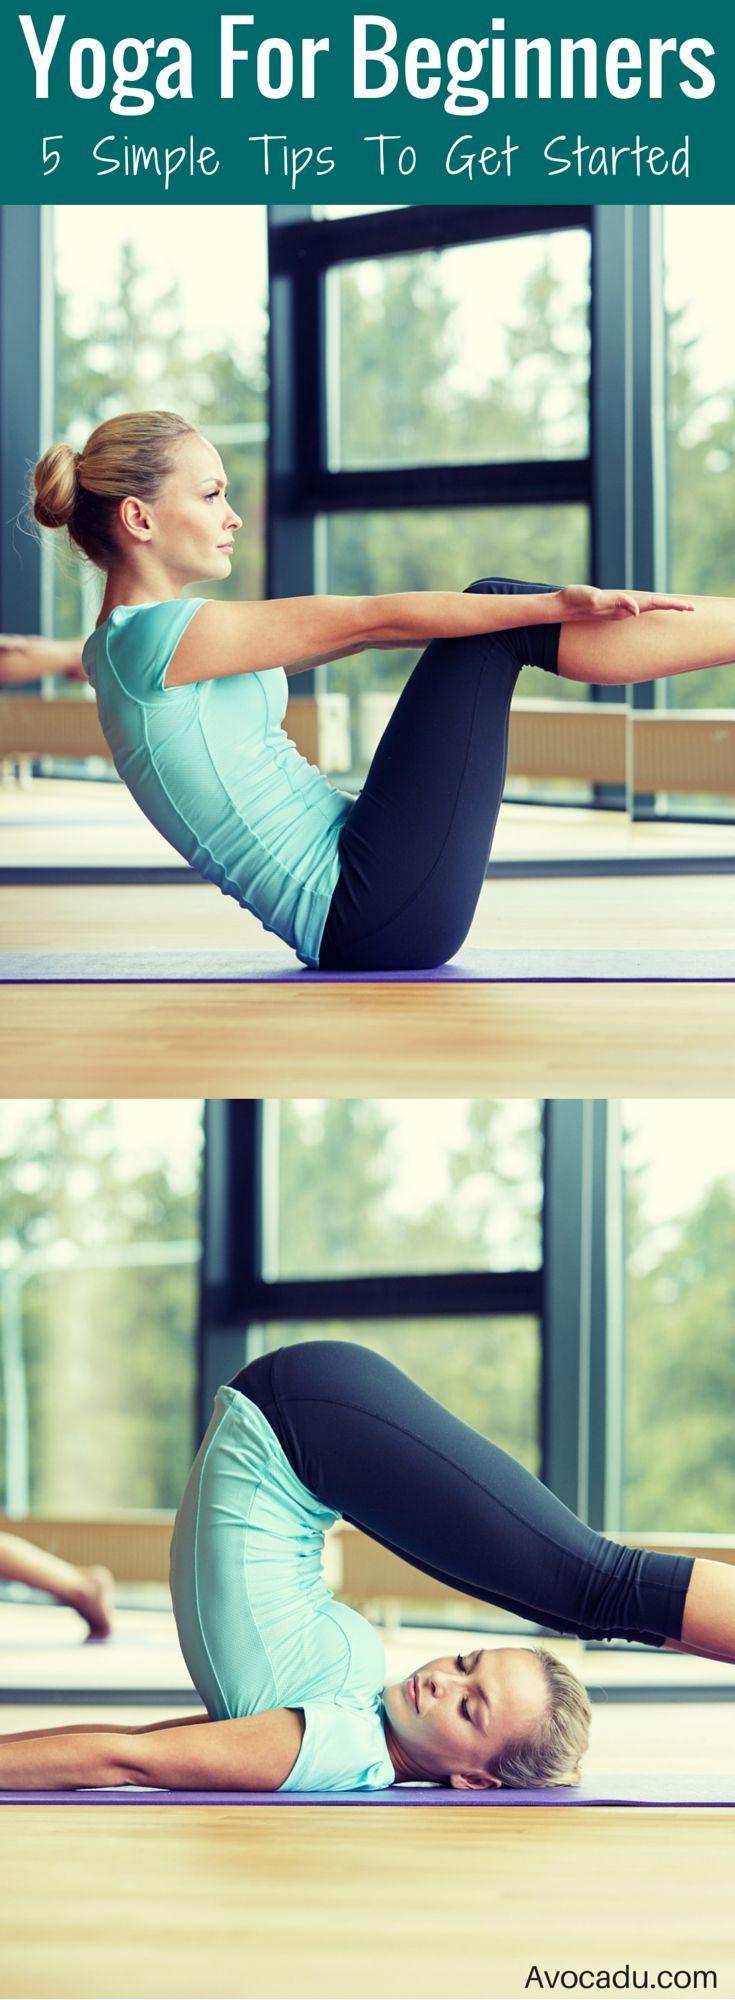 Yoga for Beginners | Yoga Tips for Beginners | Yoga Workout Tips | avocadu.com/....